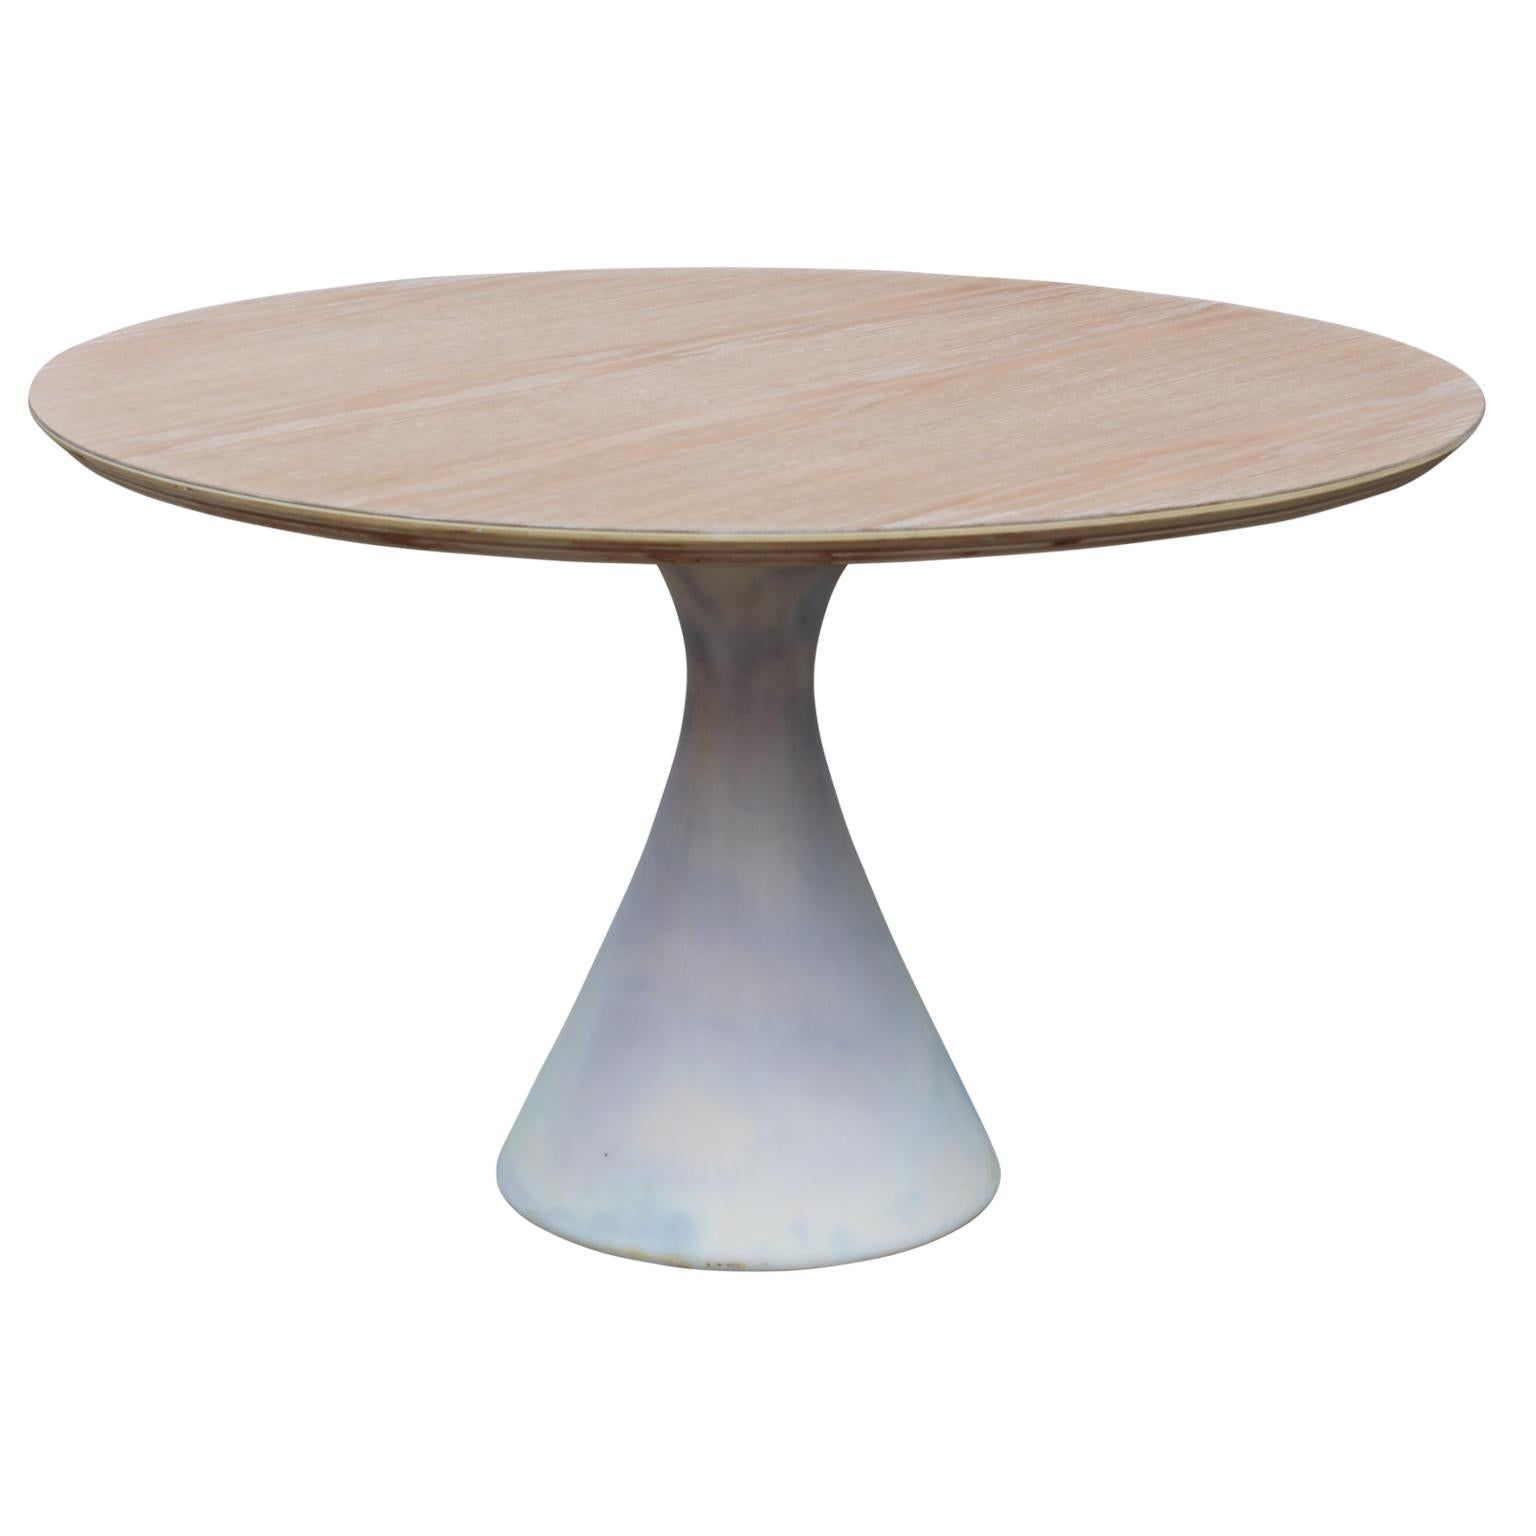 Custom Postmodern Round Wooden Tulip Table